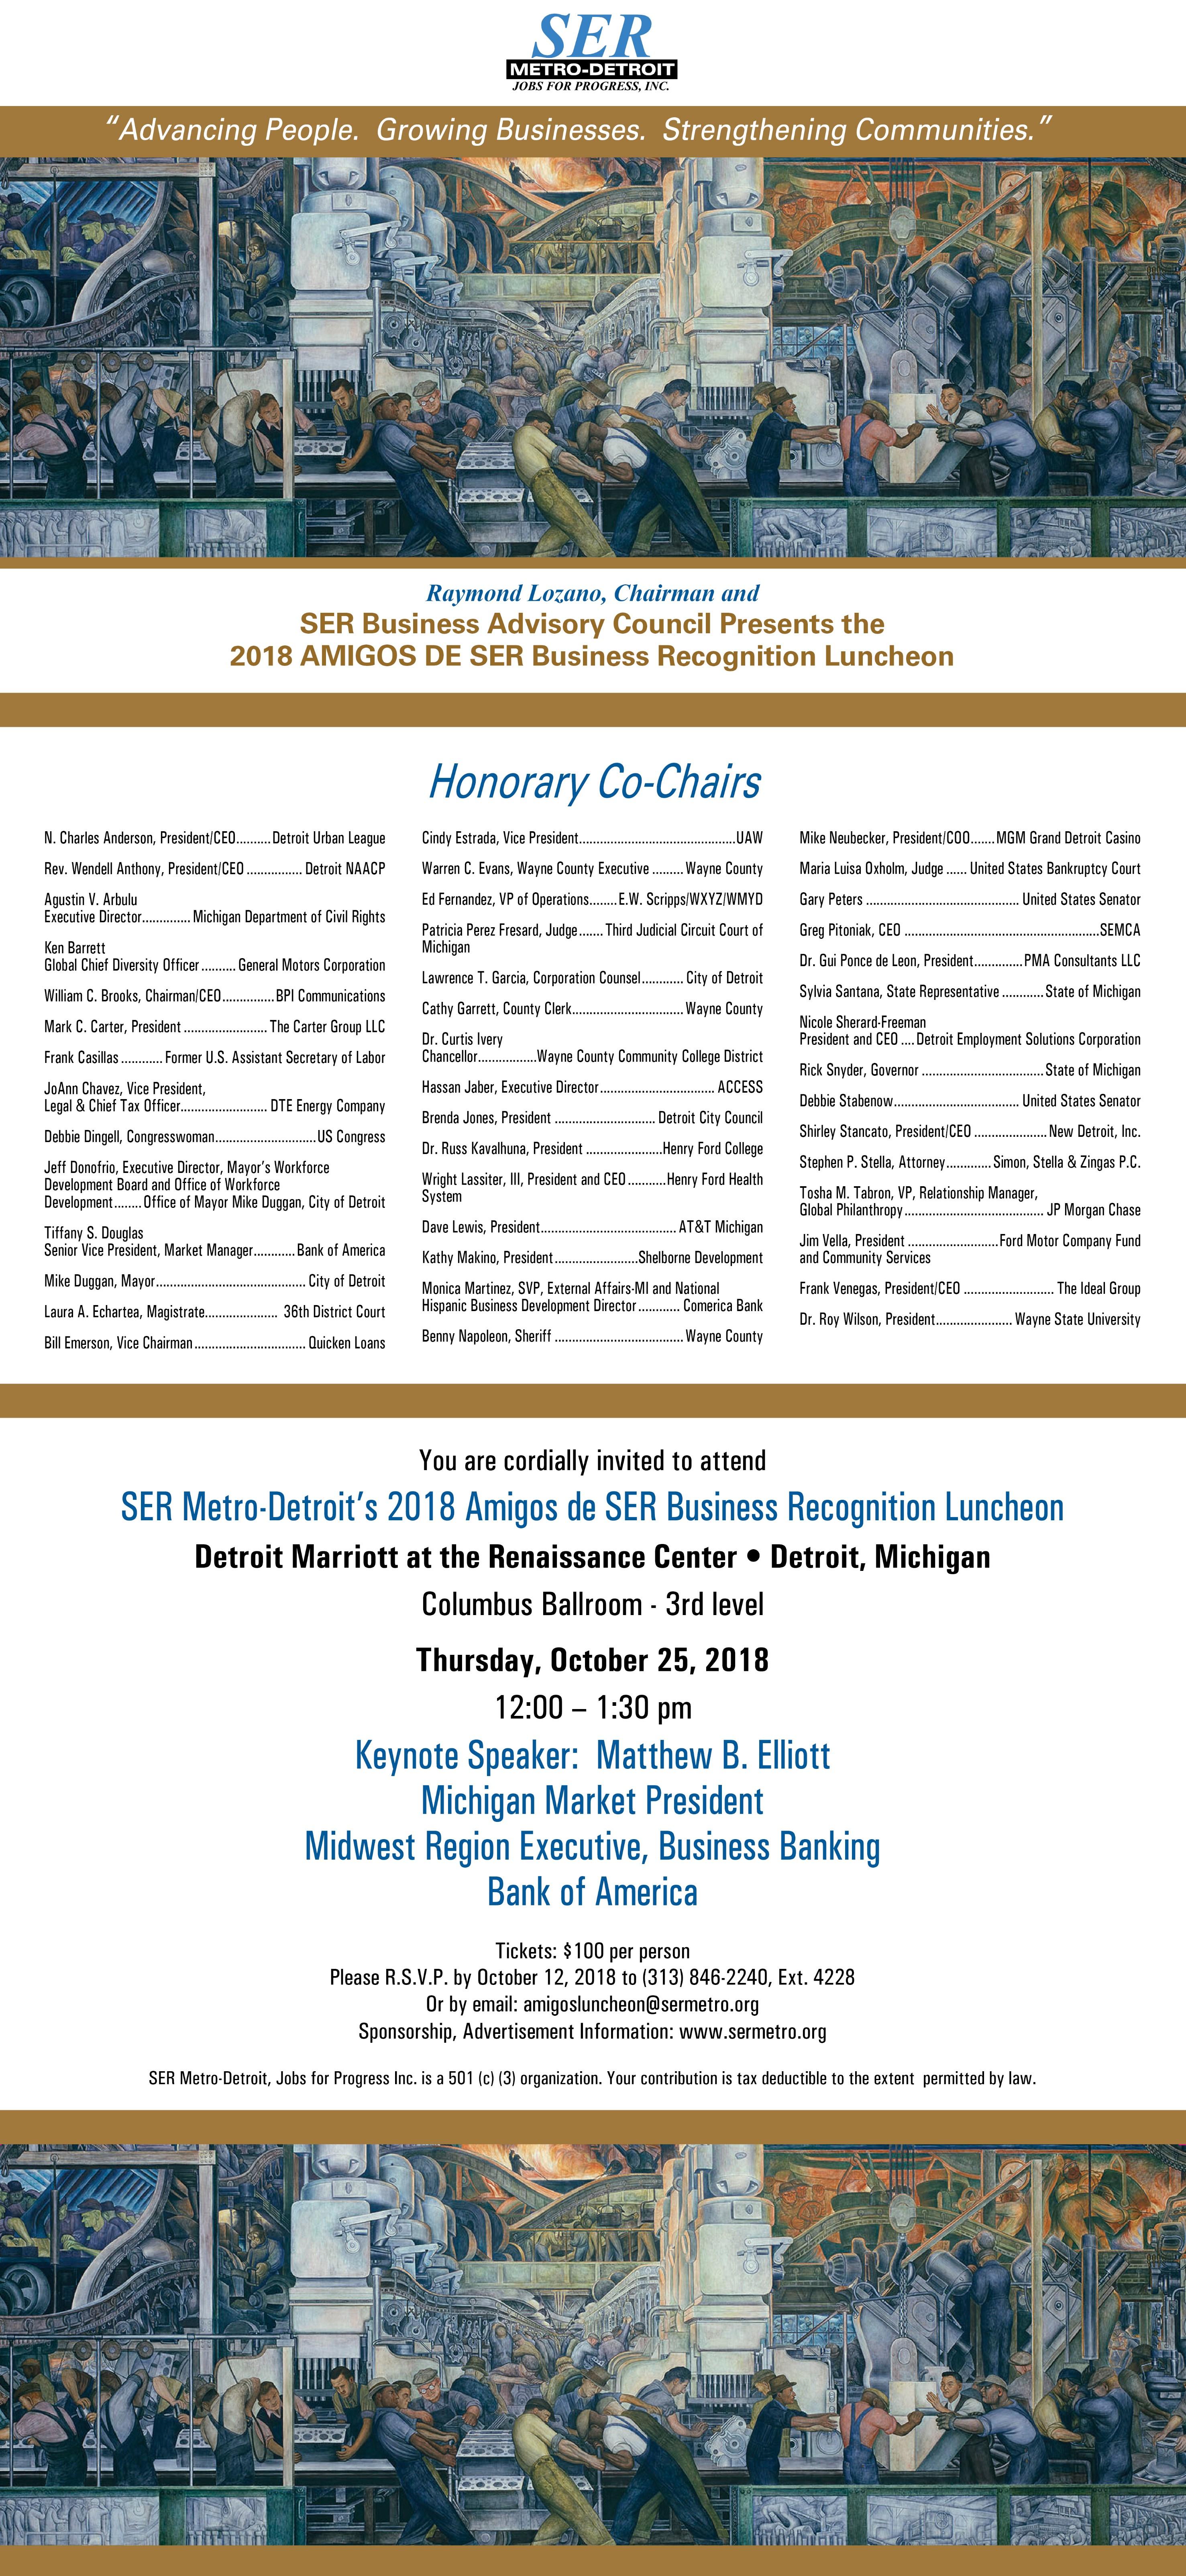 Wayne State Calendar.2018 Amigos De Ser Business Recognition Luncheon Ser Metro Detroit